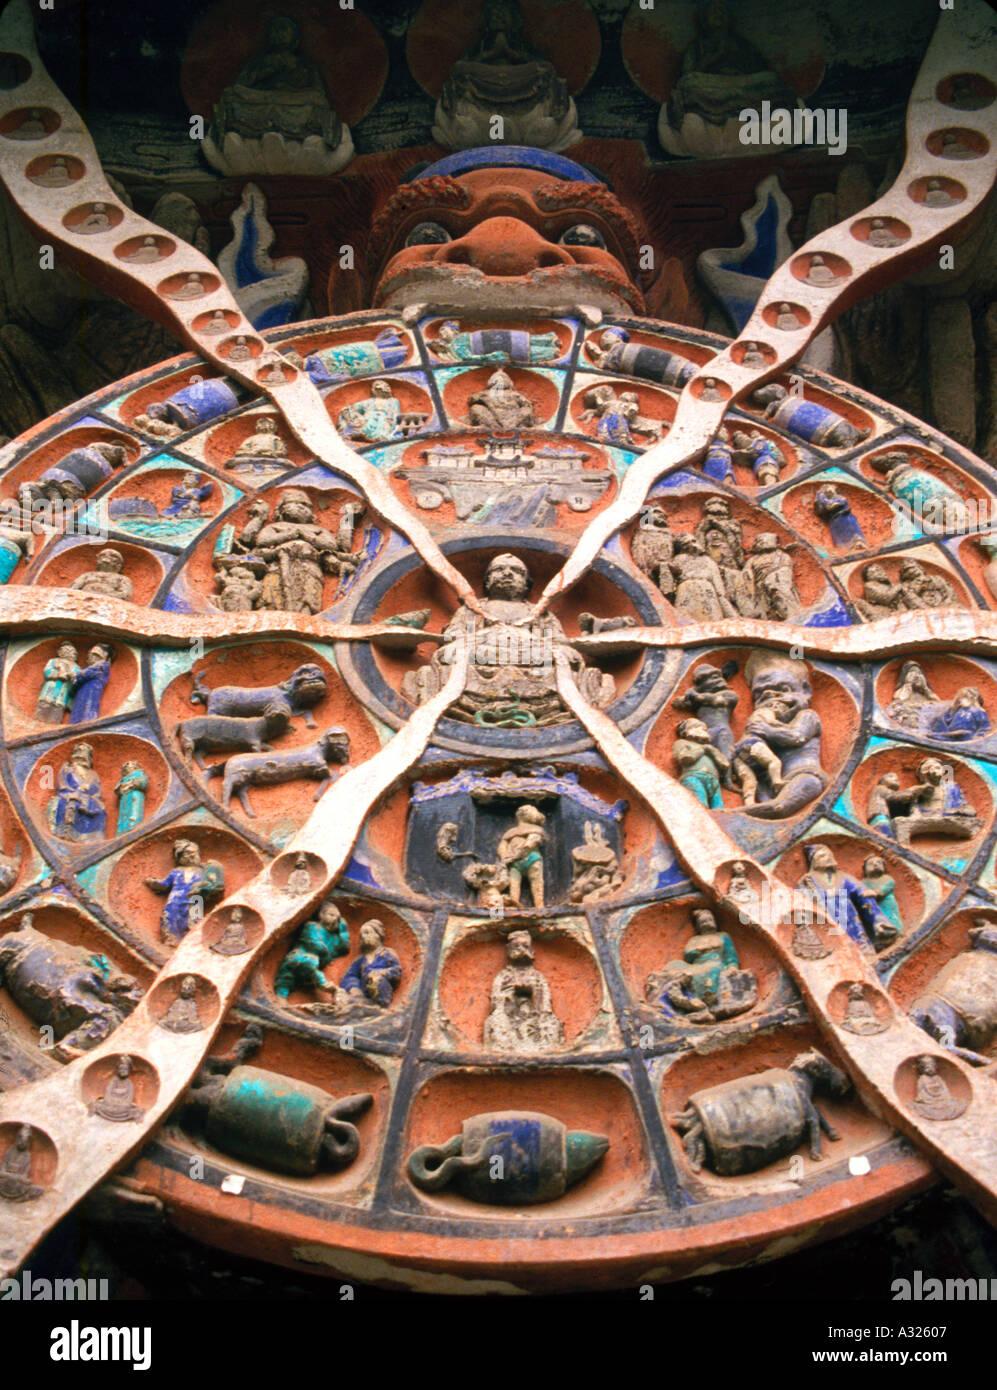 Buddhist cave carvings at Dazu China 4 - Stock Image